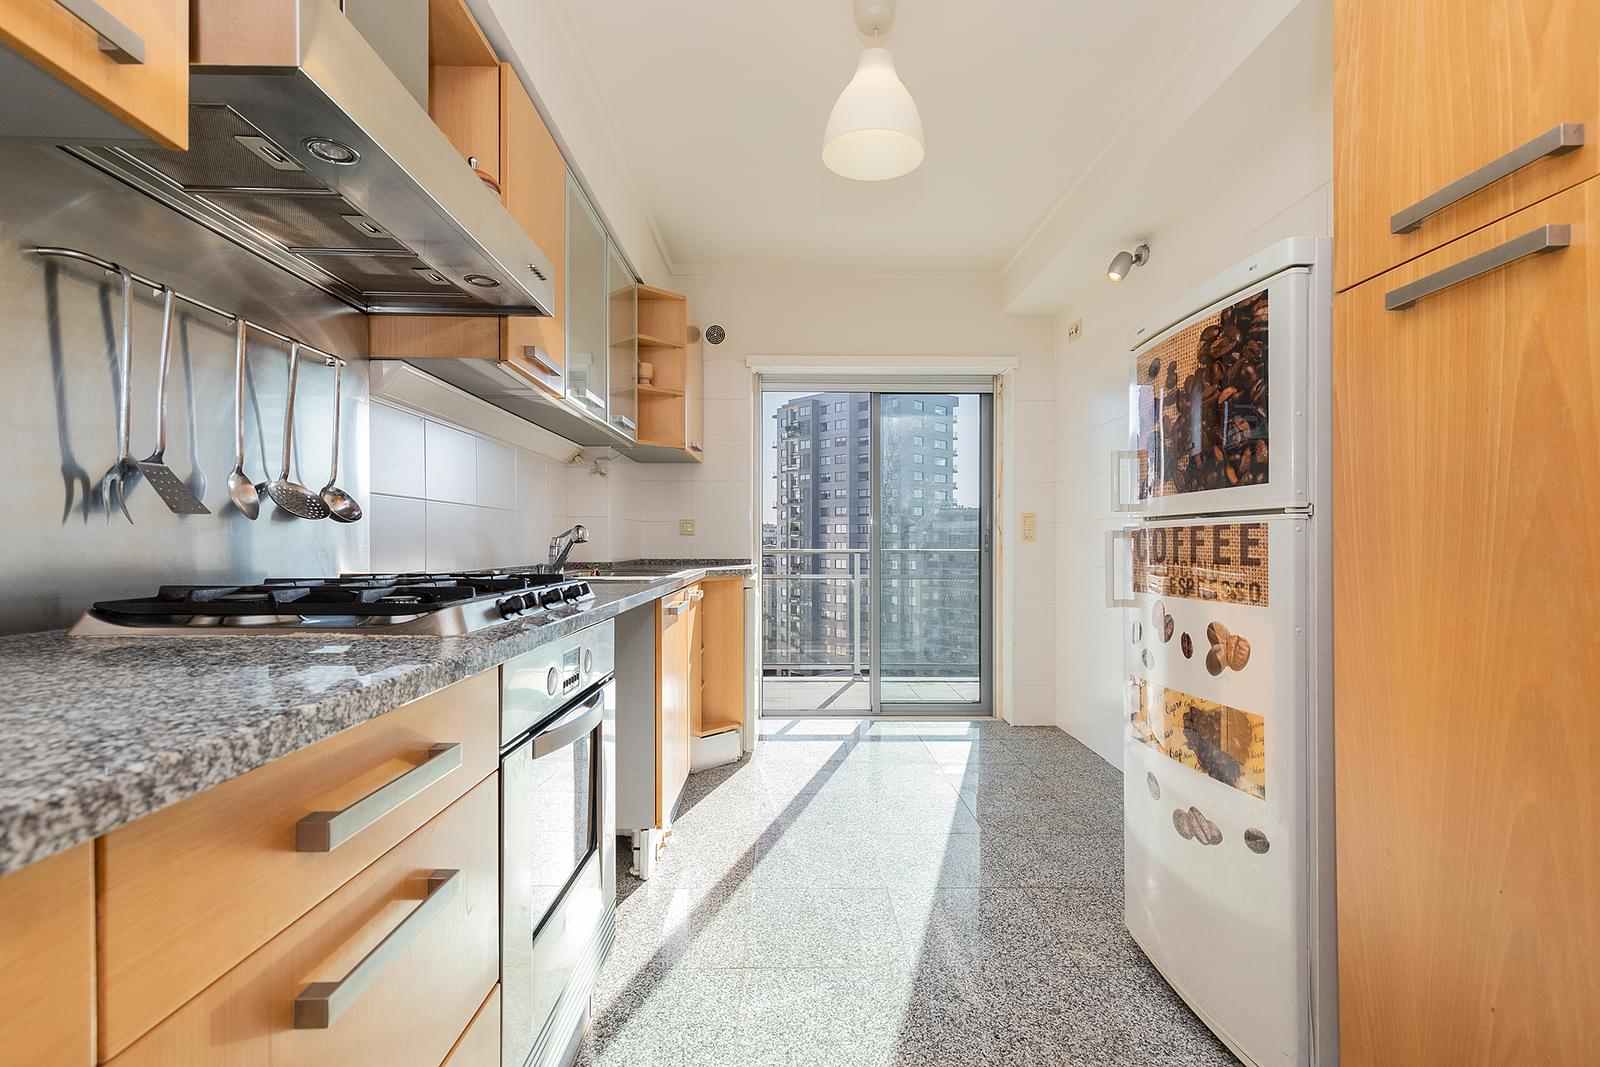 pf18953-apartamento-t3-lisboa-43047b19-479c-471f-a924-f1fb9f131186